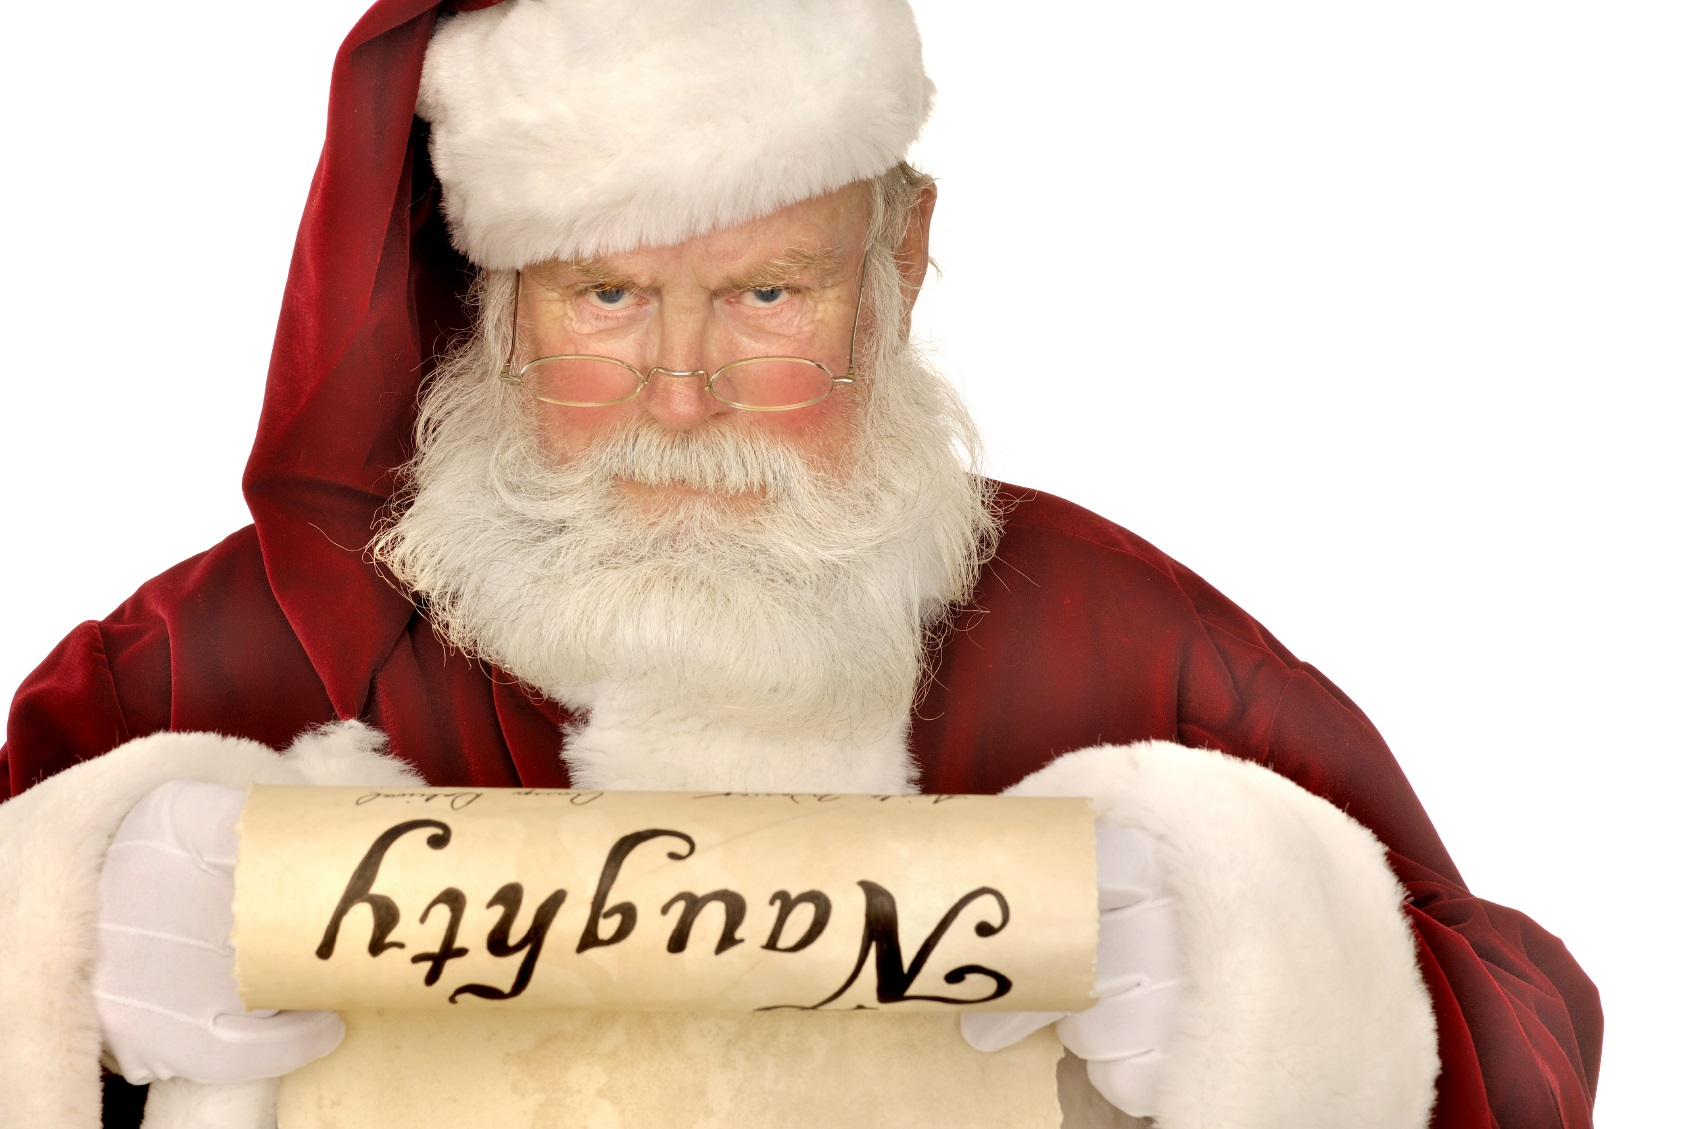 Santa Claus Village, Rovaniemi: Address, Phone Number, Santa Claus Village Reviews: 4/5